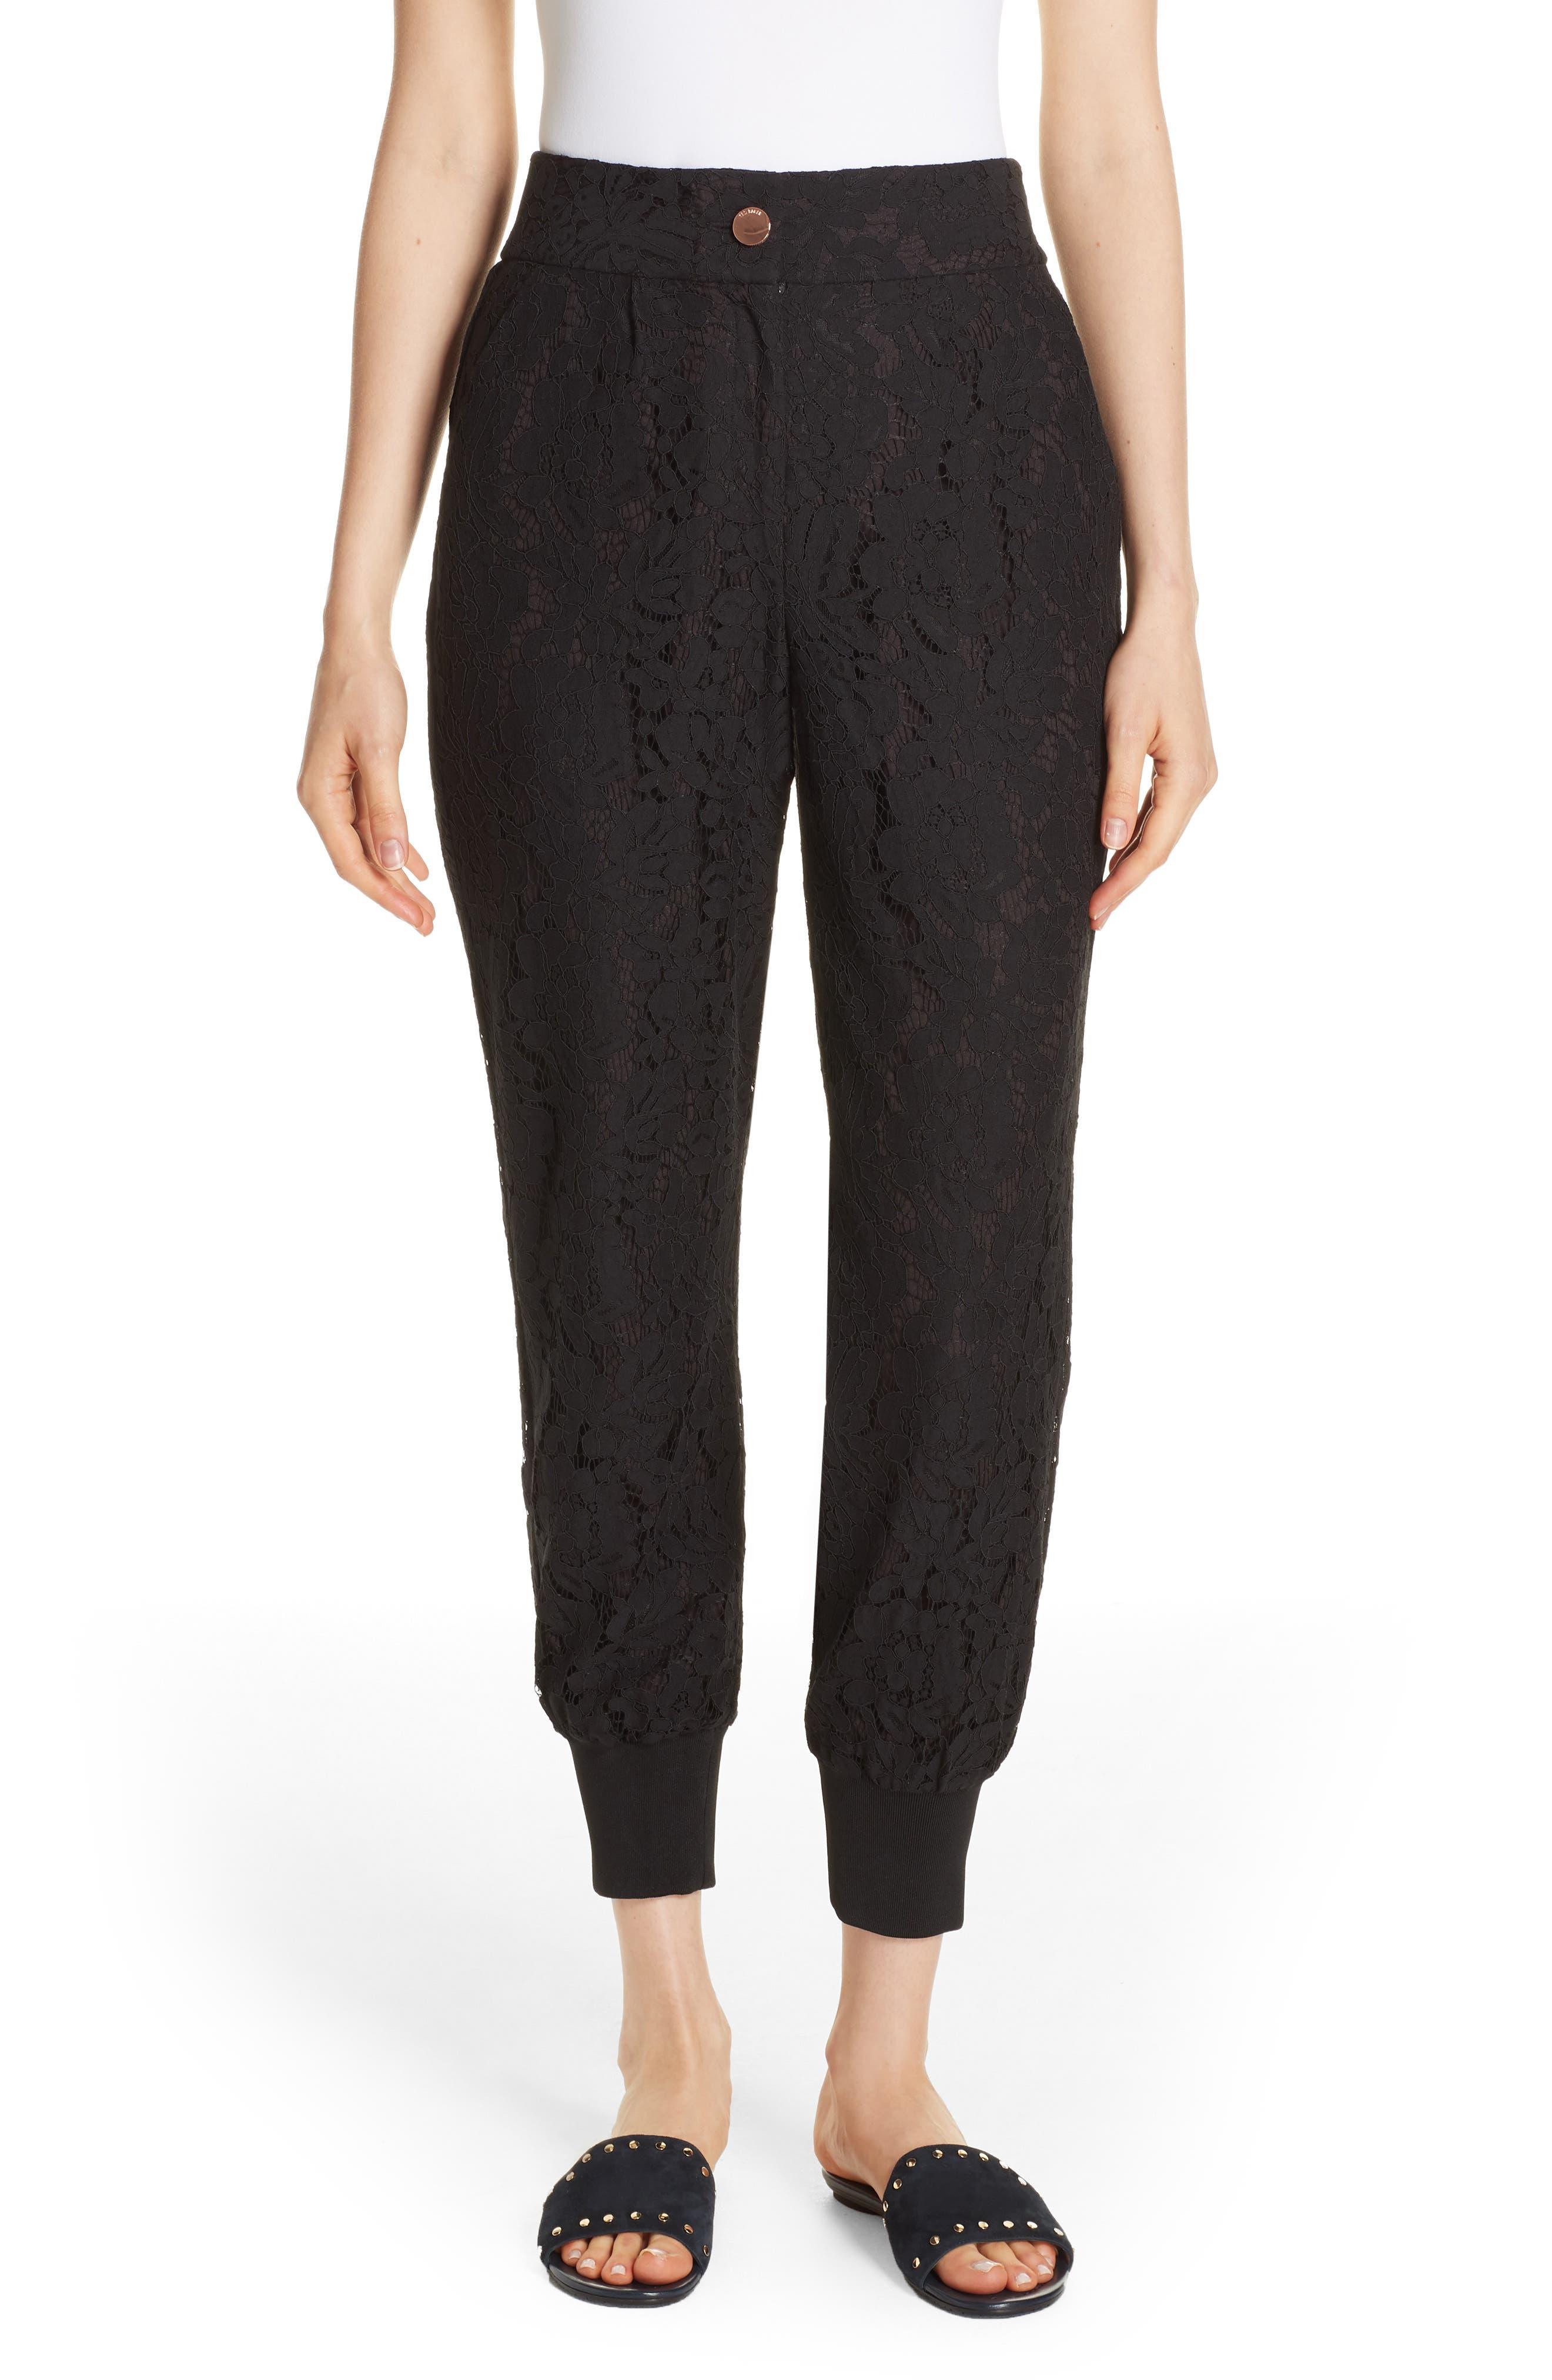 Cylar Lace Detail Formal Jogger Pants, Main, color, BLACK